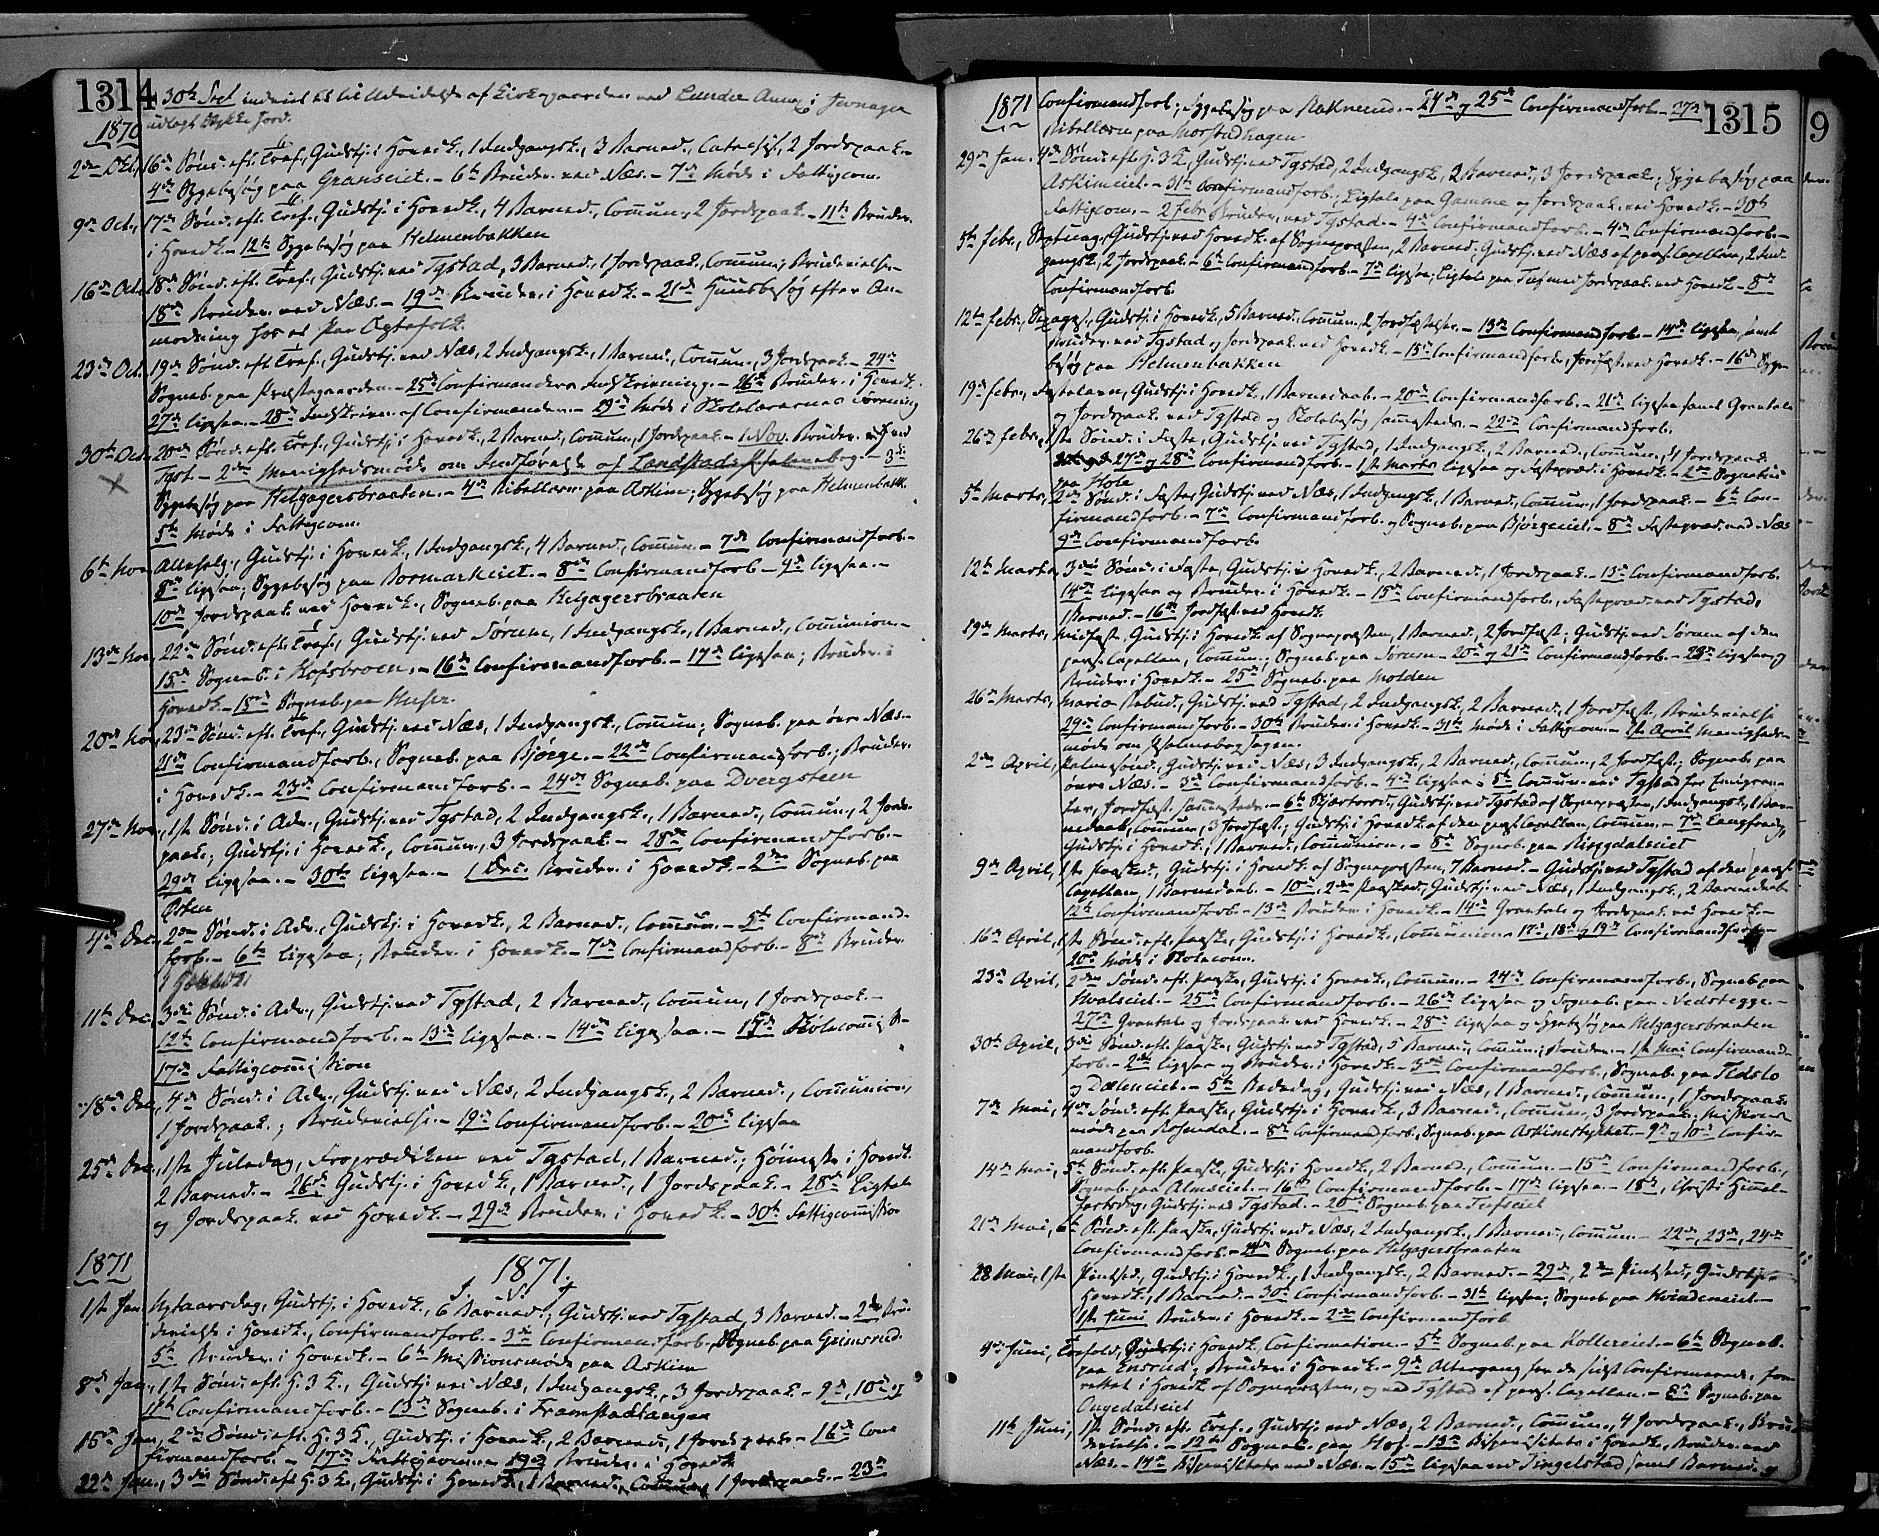 SAH, Gran prestekontor, Ministerialbok nr. 12, 1856-1874, s. 1314-1315